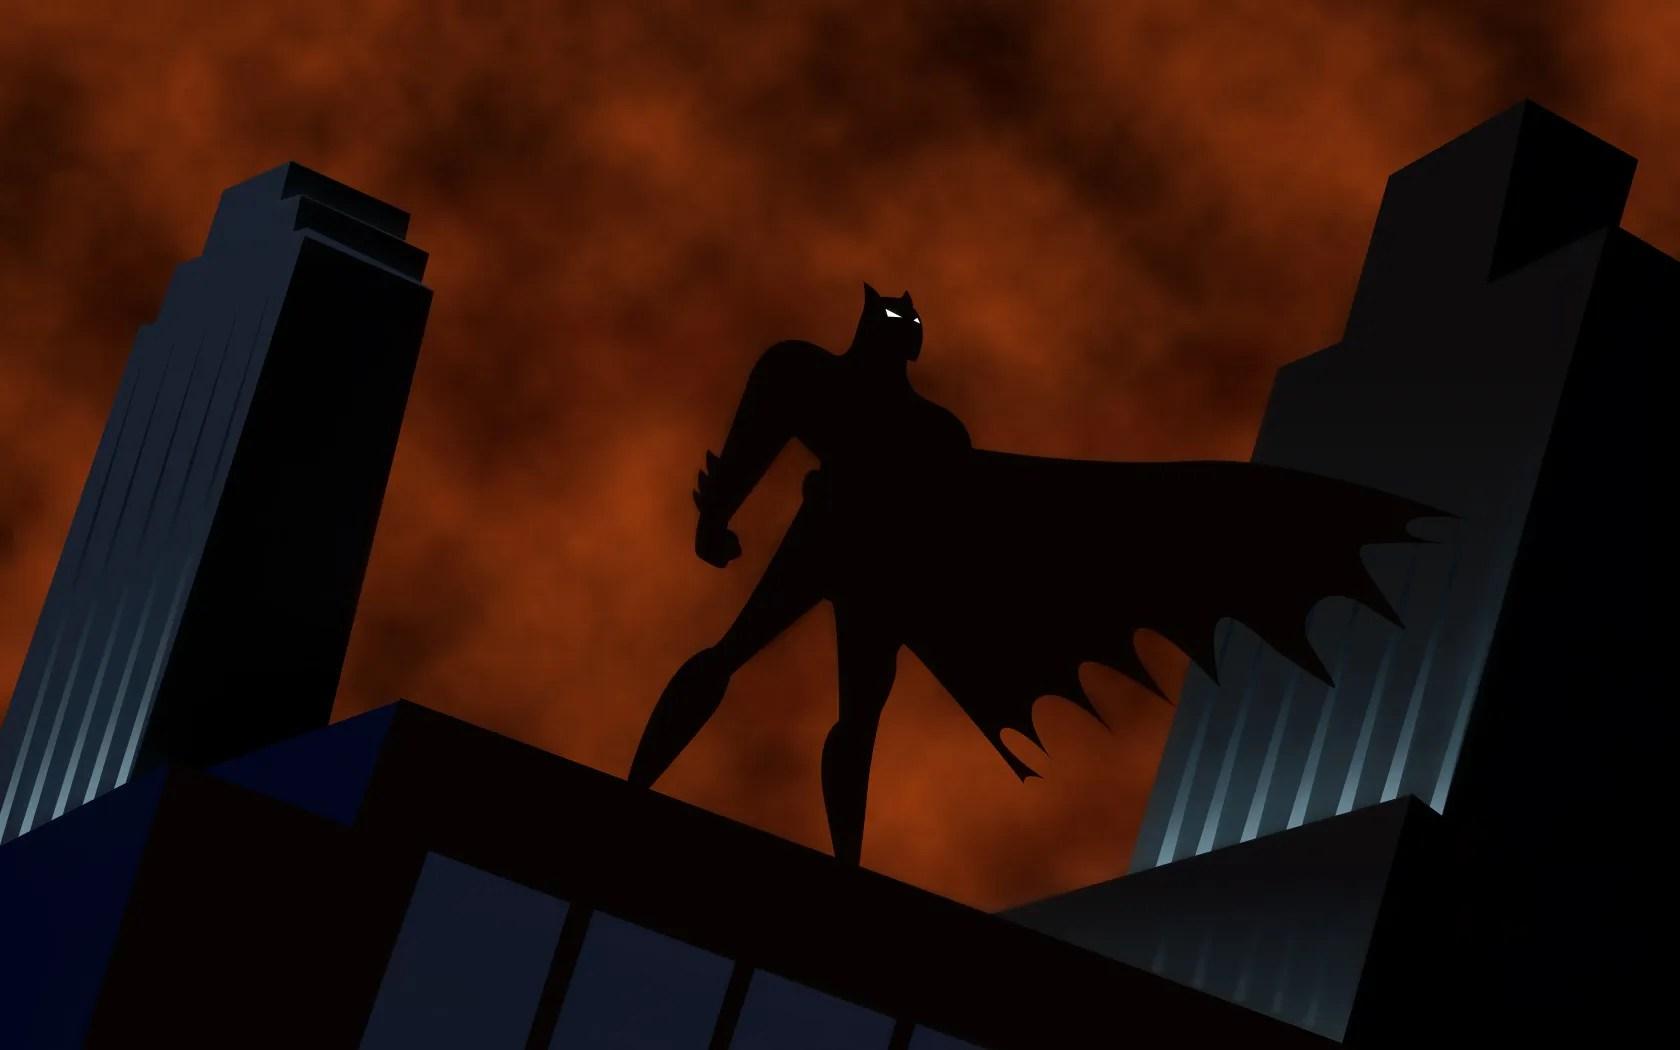 https://i0.wp.com/cdn.collider.com/wp-content/uploads/2016/03/batman-the-animated-series-3.jpg